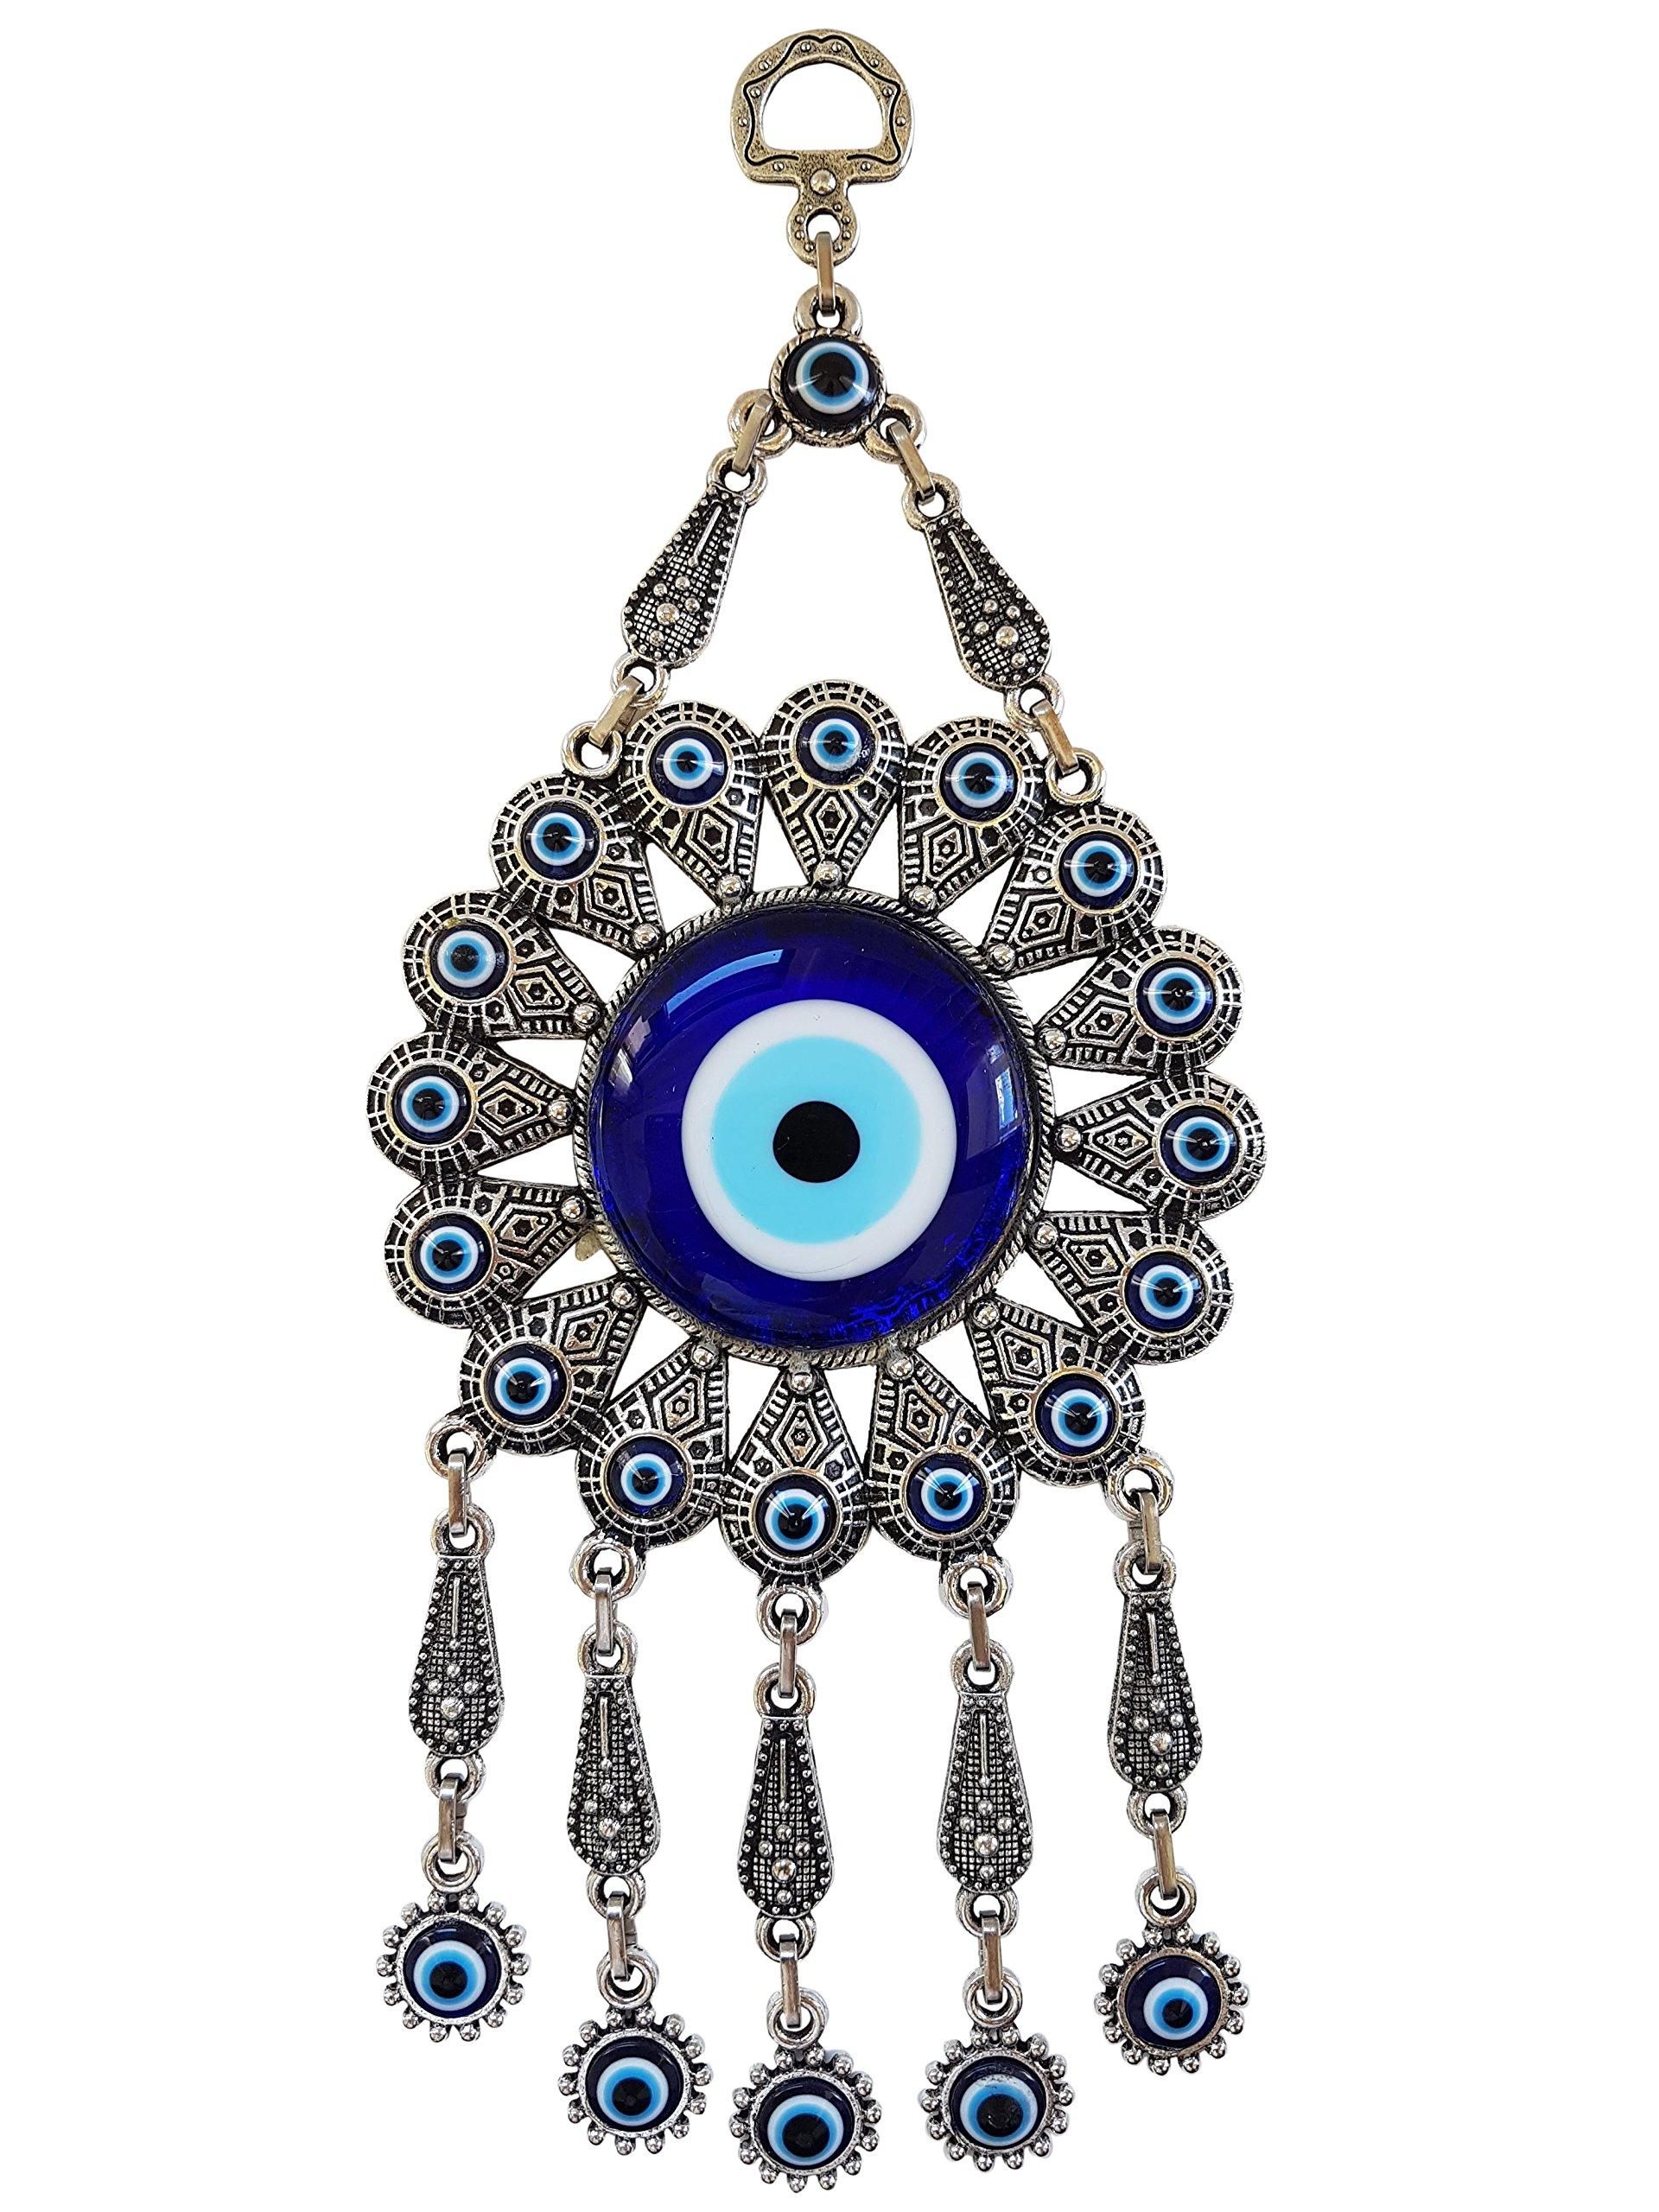 Bead Global Turkish Glass Flower Design Blue Evil Eye Wall